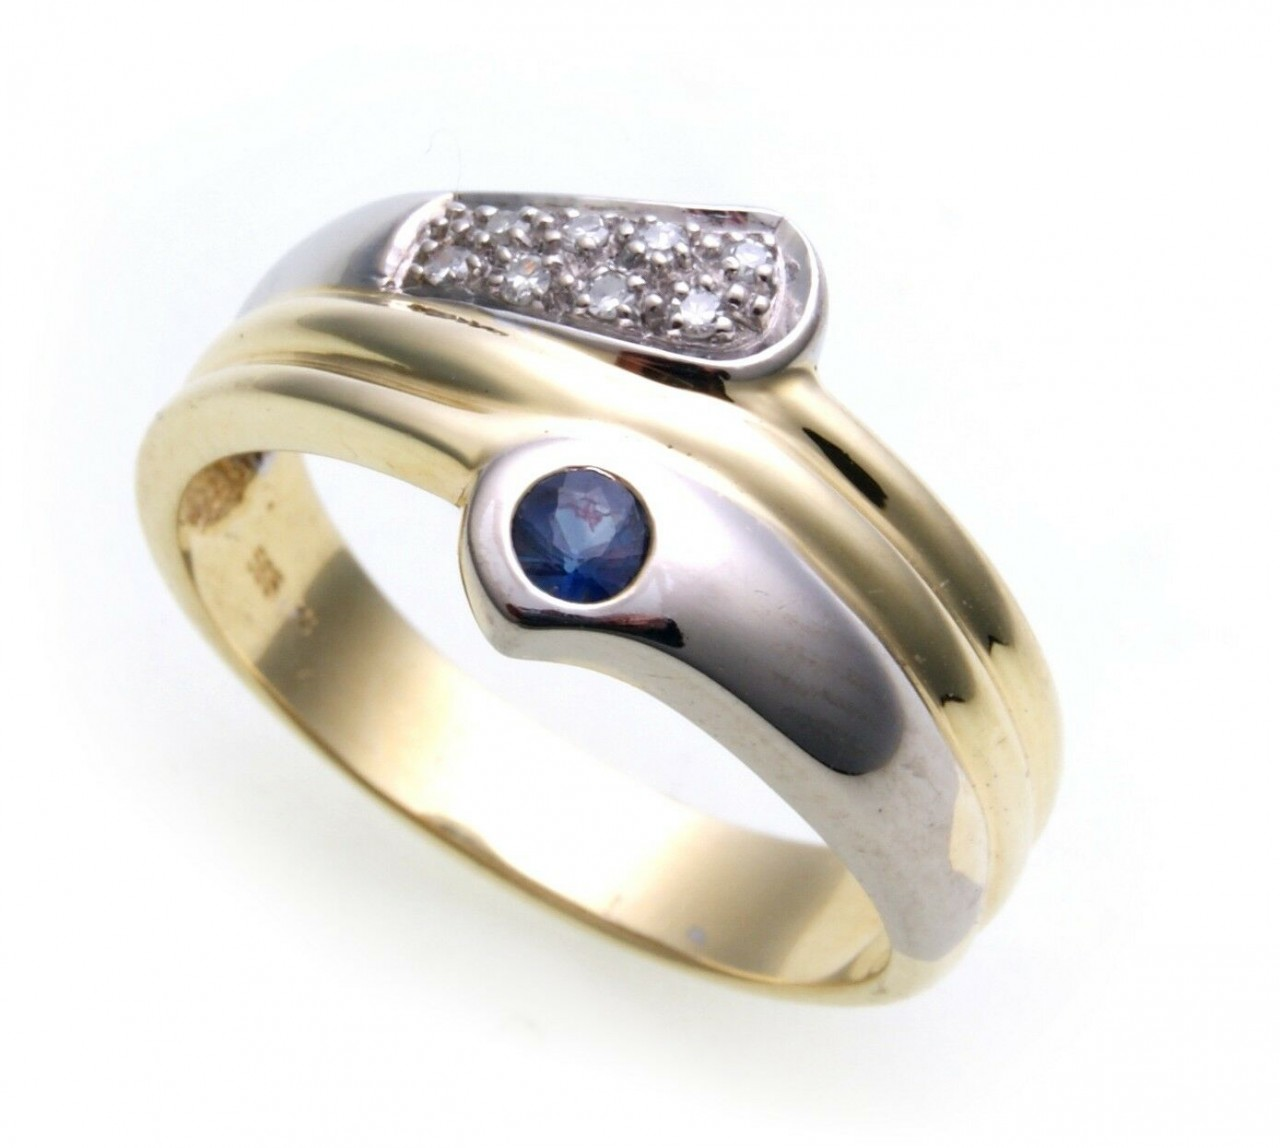 Damen Ring Saphir echt Gold 585 Brillant 0,08 ct 14 karat Gelbgold Diamant Neu